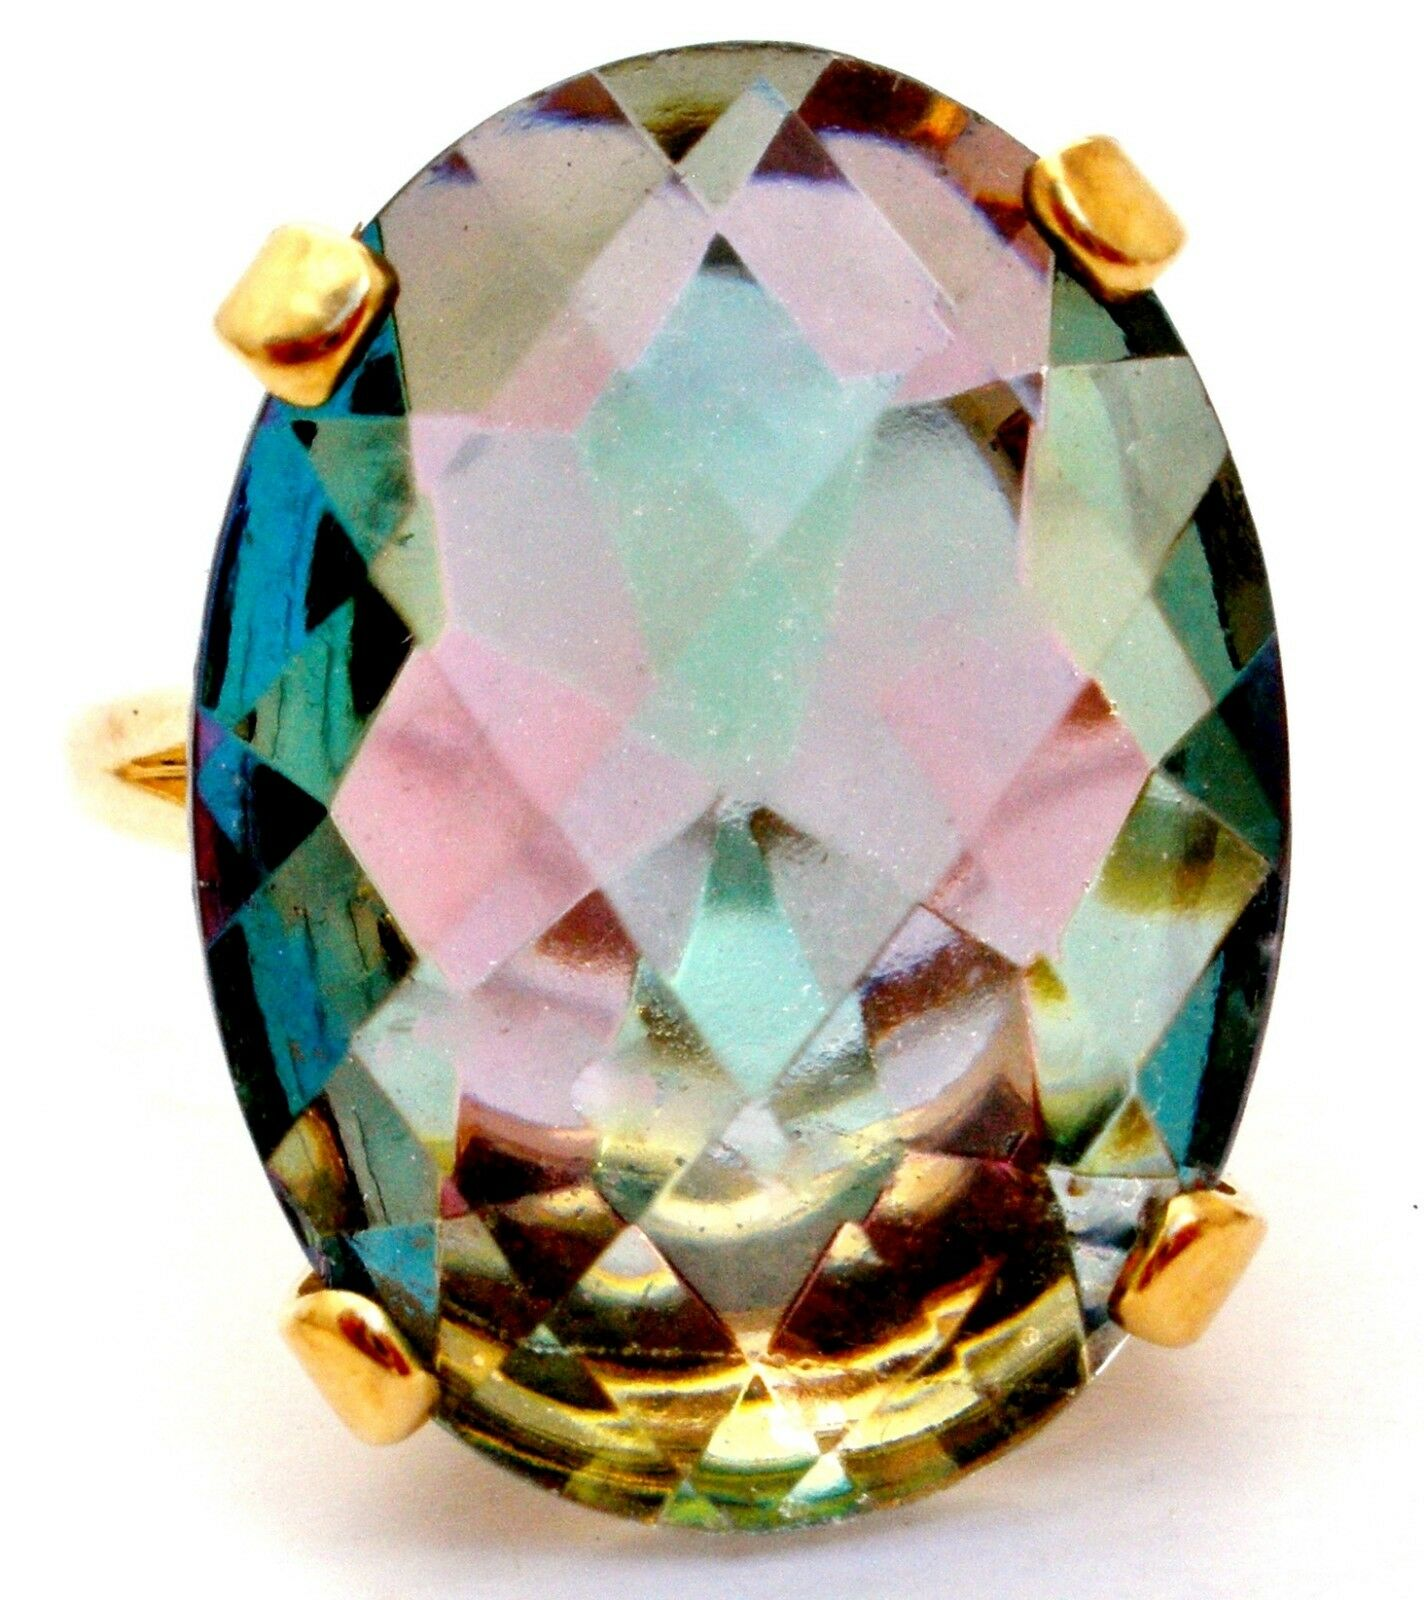 Mystic Topaz Ring 14K Yellow gold 19 Carats Size 11.25 Fine Gemstone Jewelry